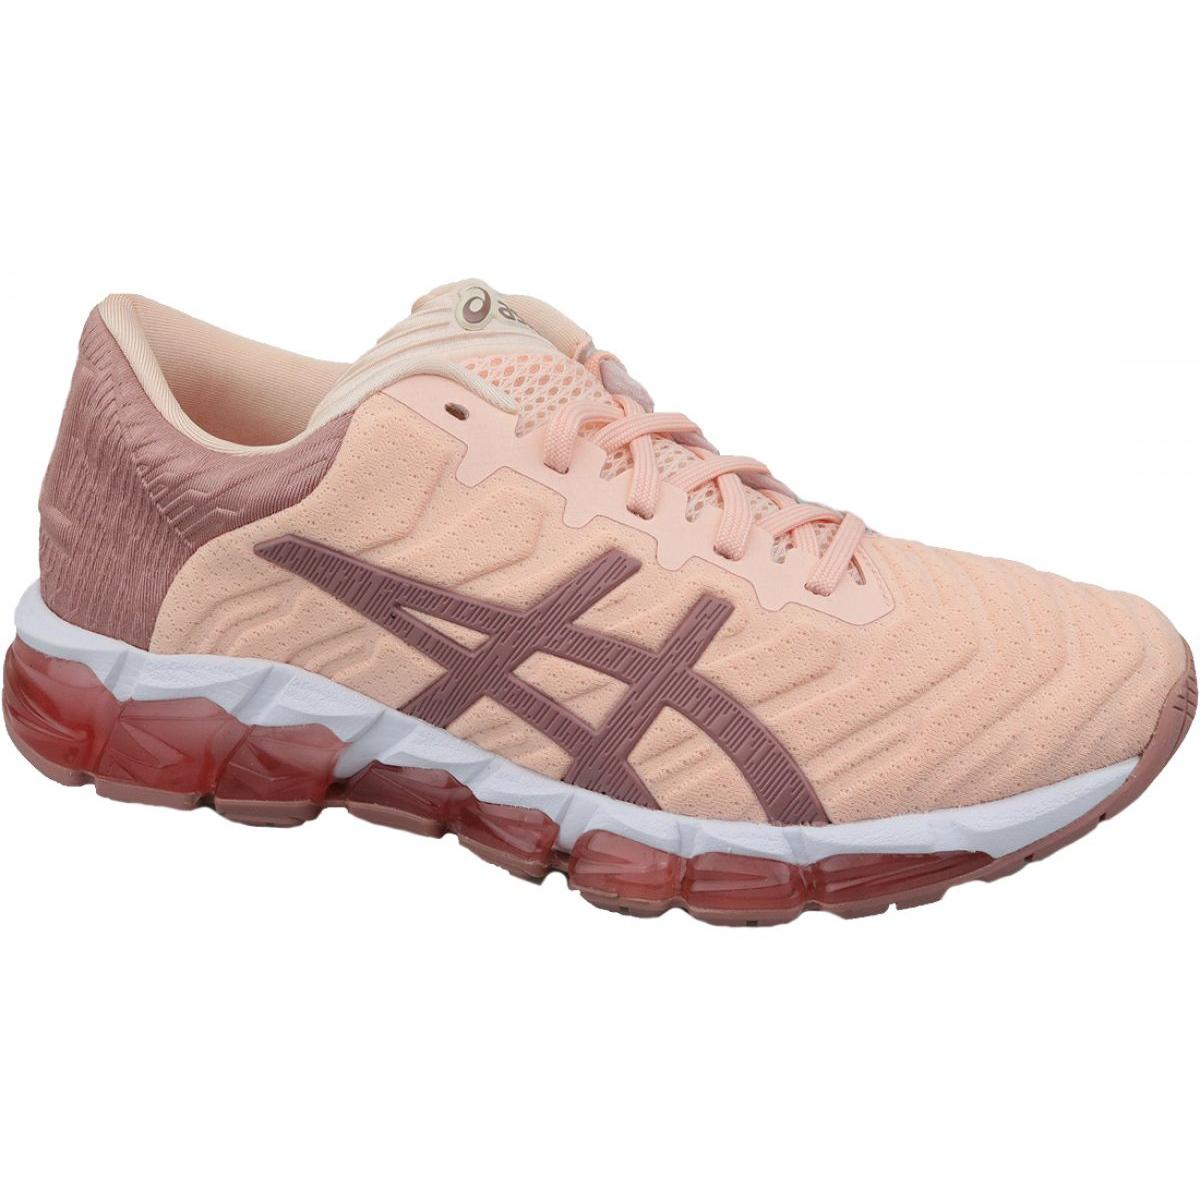 acheter populaire 96b1e fb820 Pink Running shoes Asics Gel-Quantum 360 5 W 1022A104-700